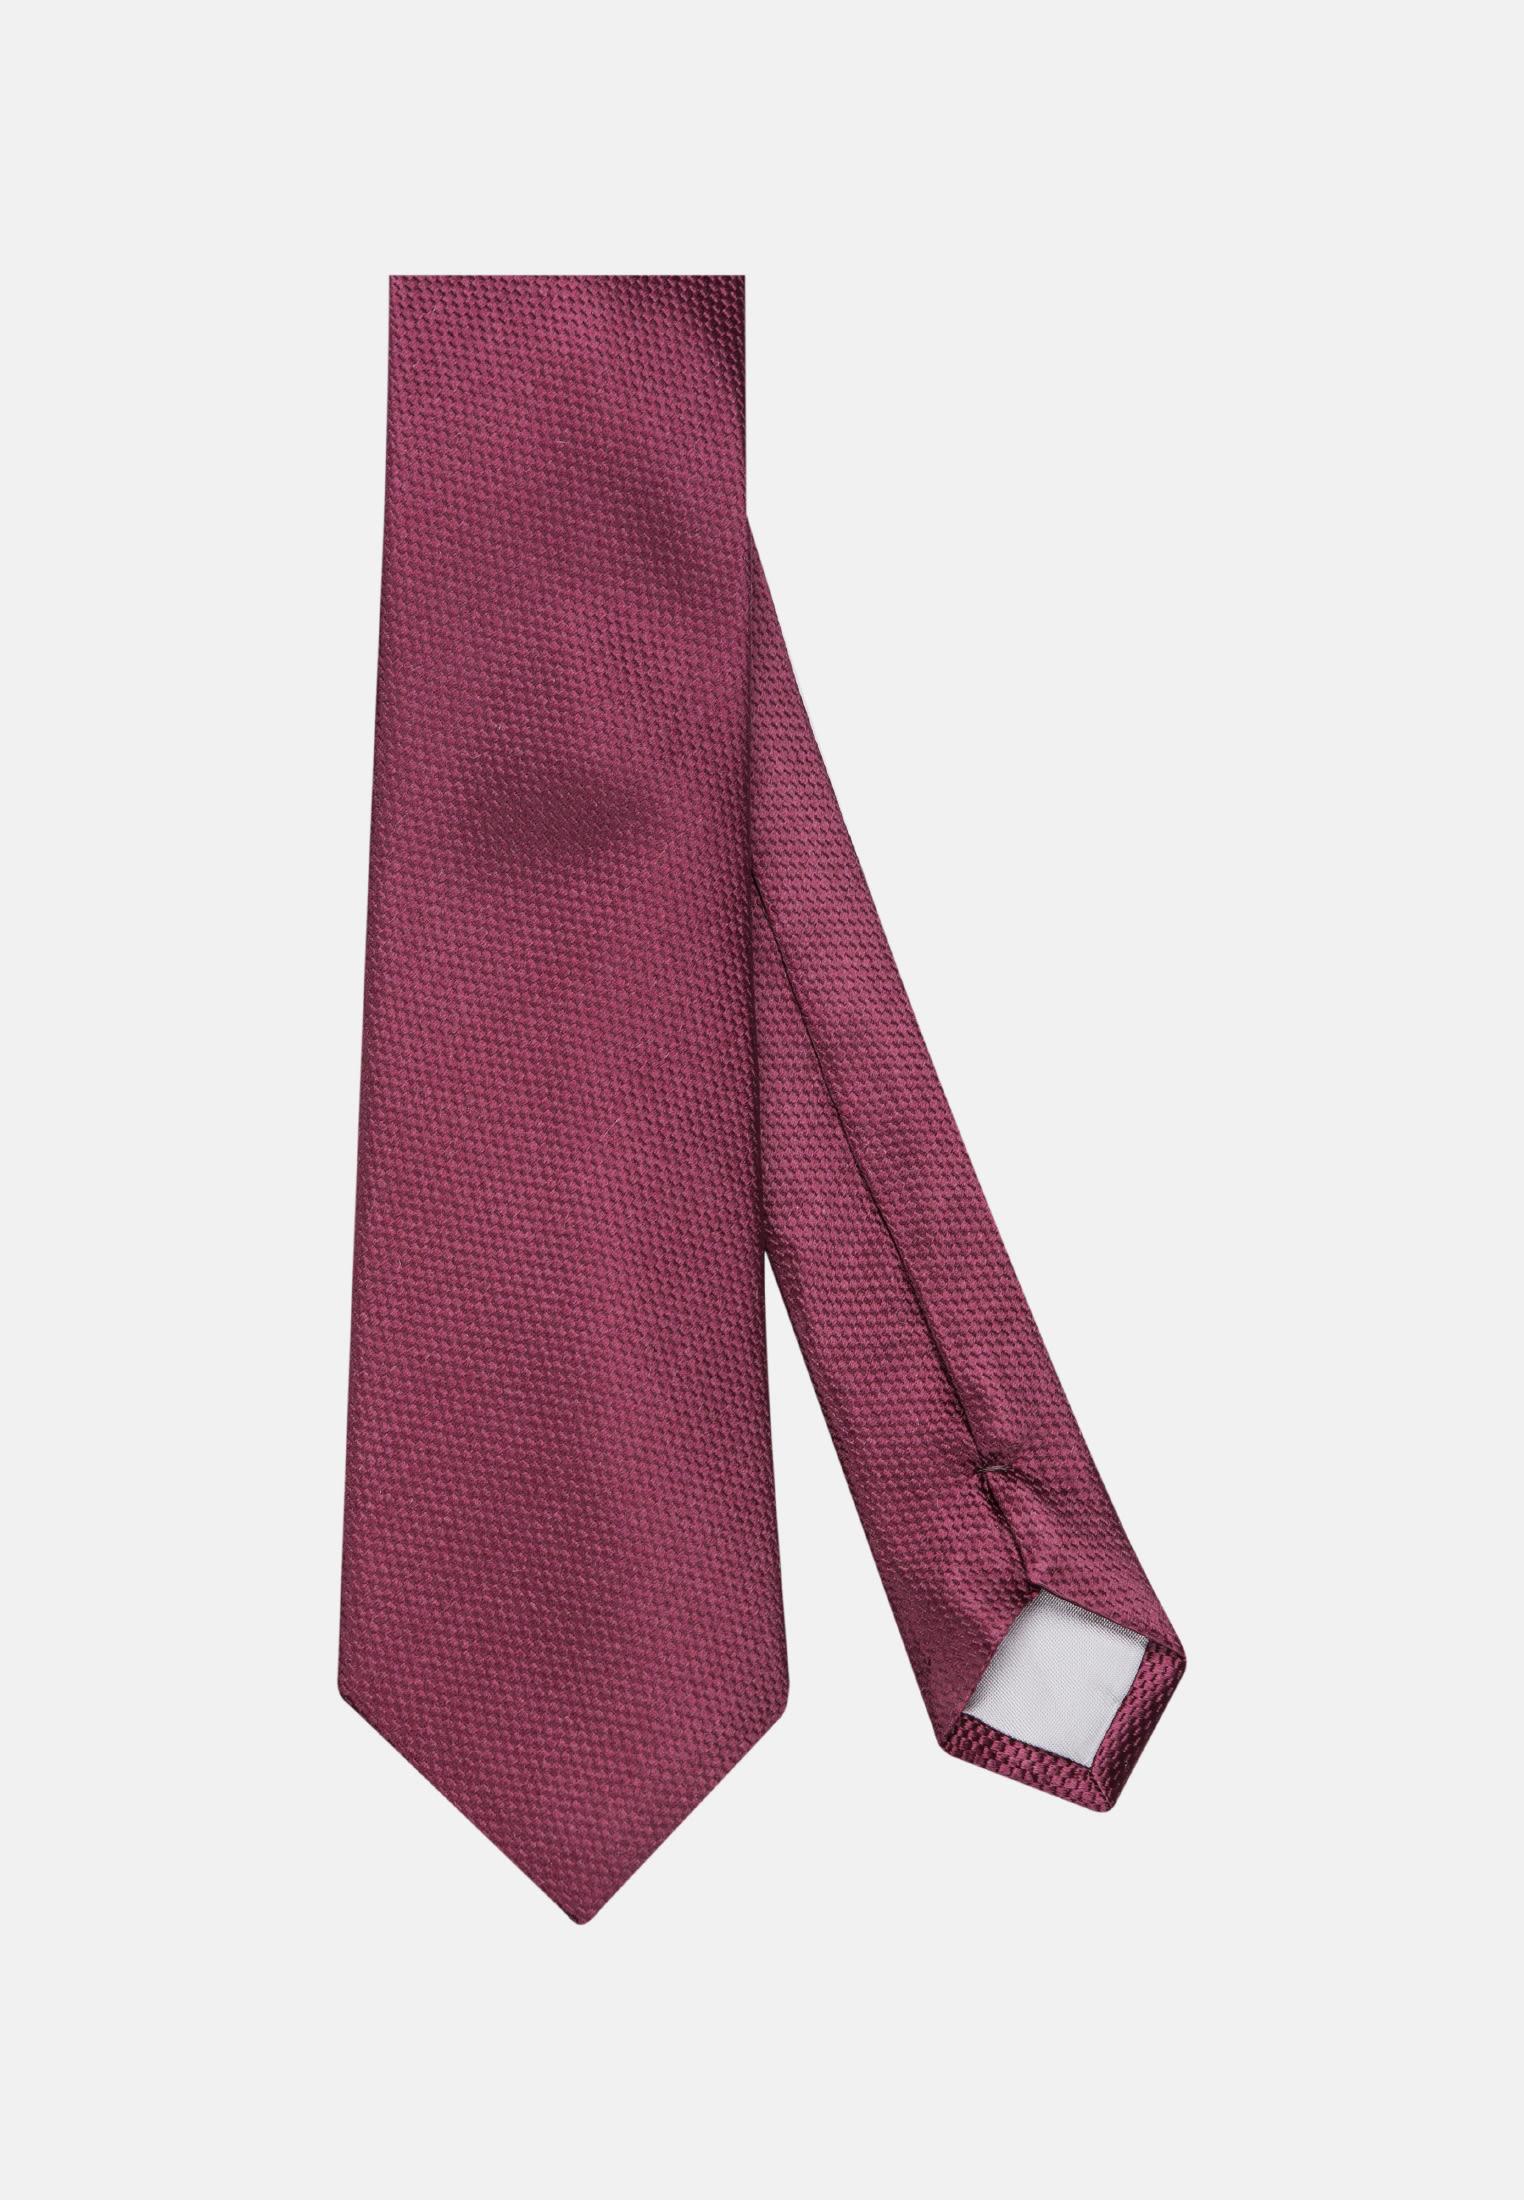 Krawatte aus 100% Seide 7 cm Breit in Rot    Jacques Britt Onlineshop